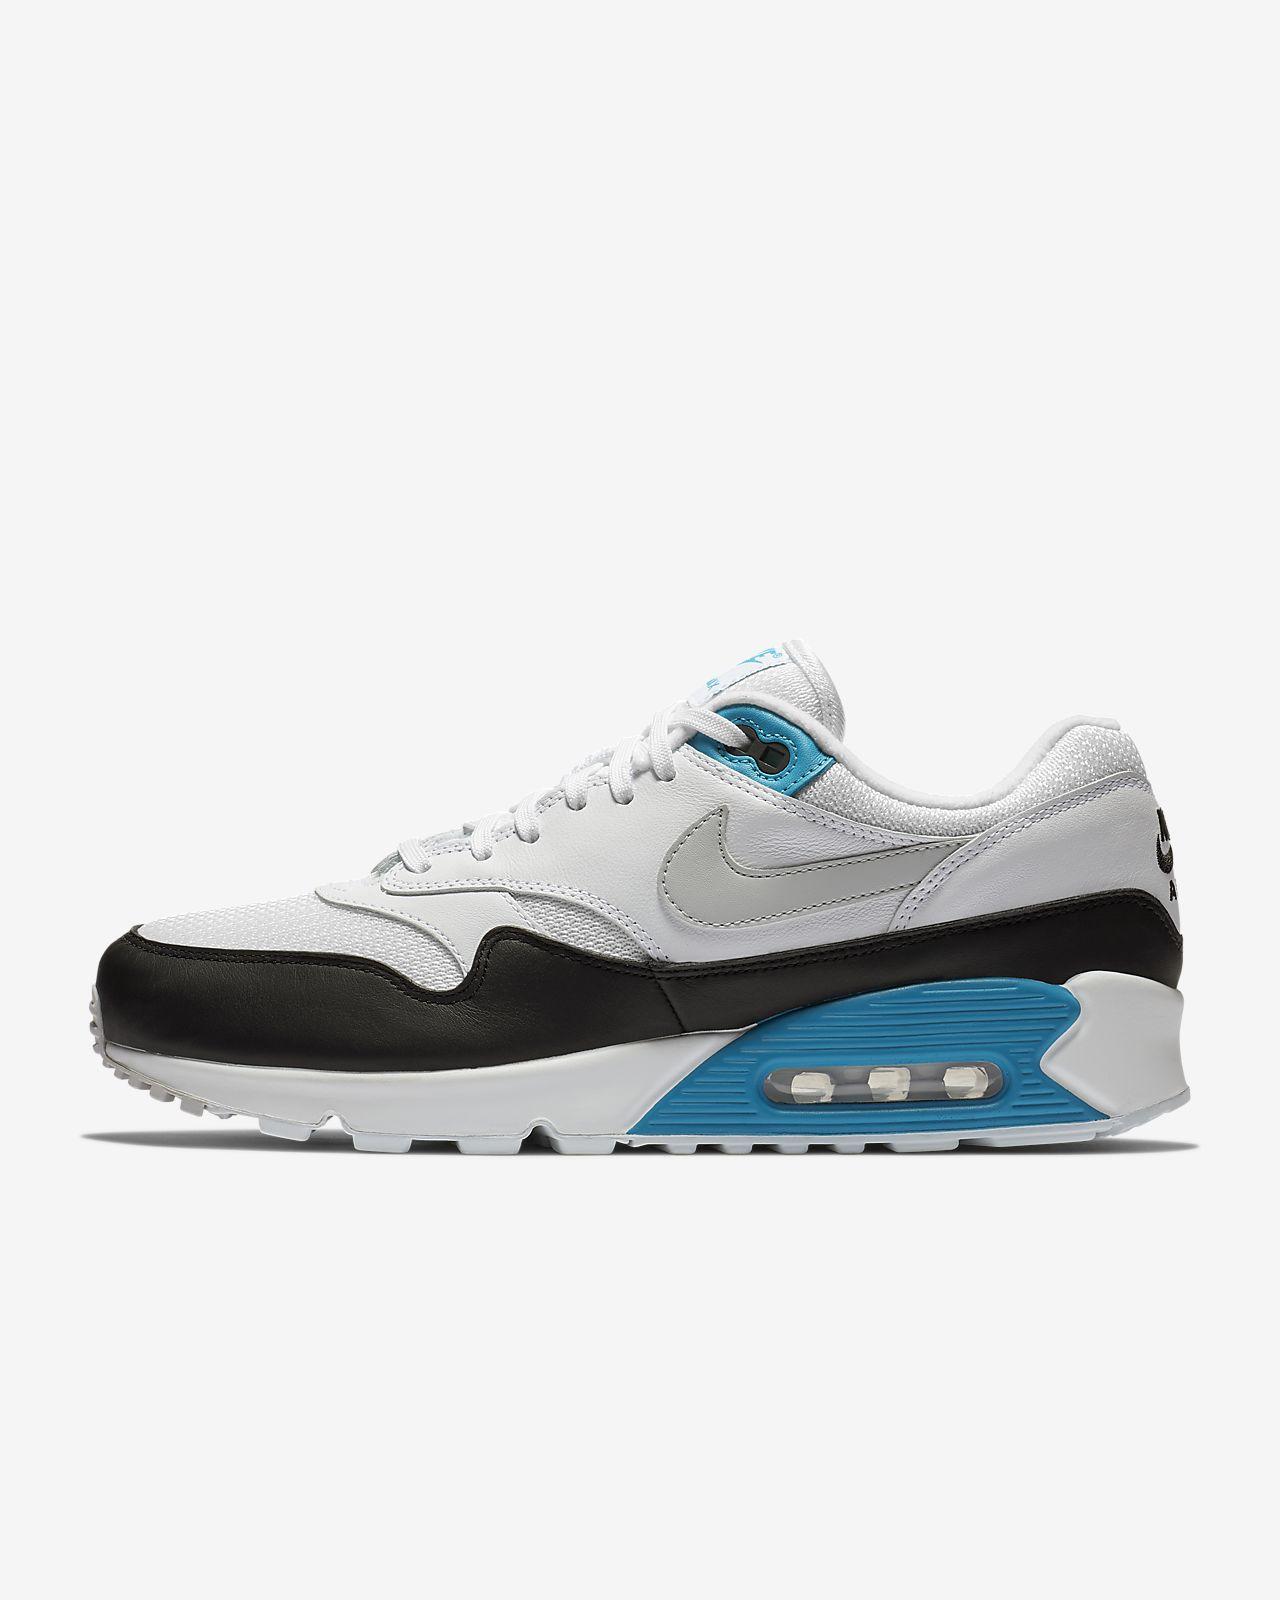 HerrenschuhCh Air Max 901 Nike Nike HerrenschuhCh 901 Air